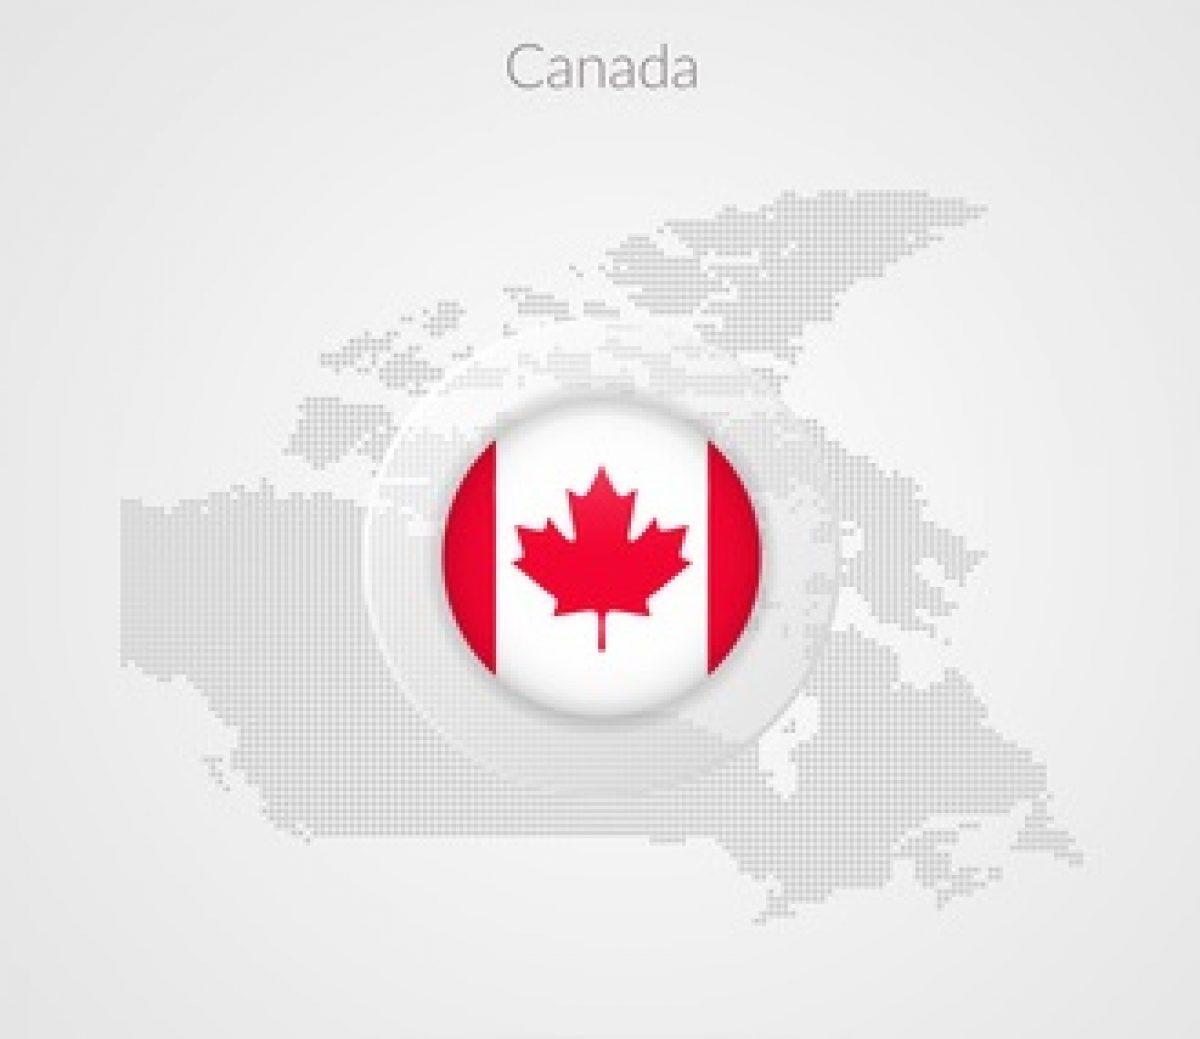 forex brokeriai kanados metatrader